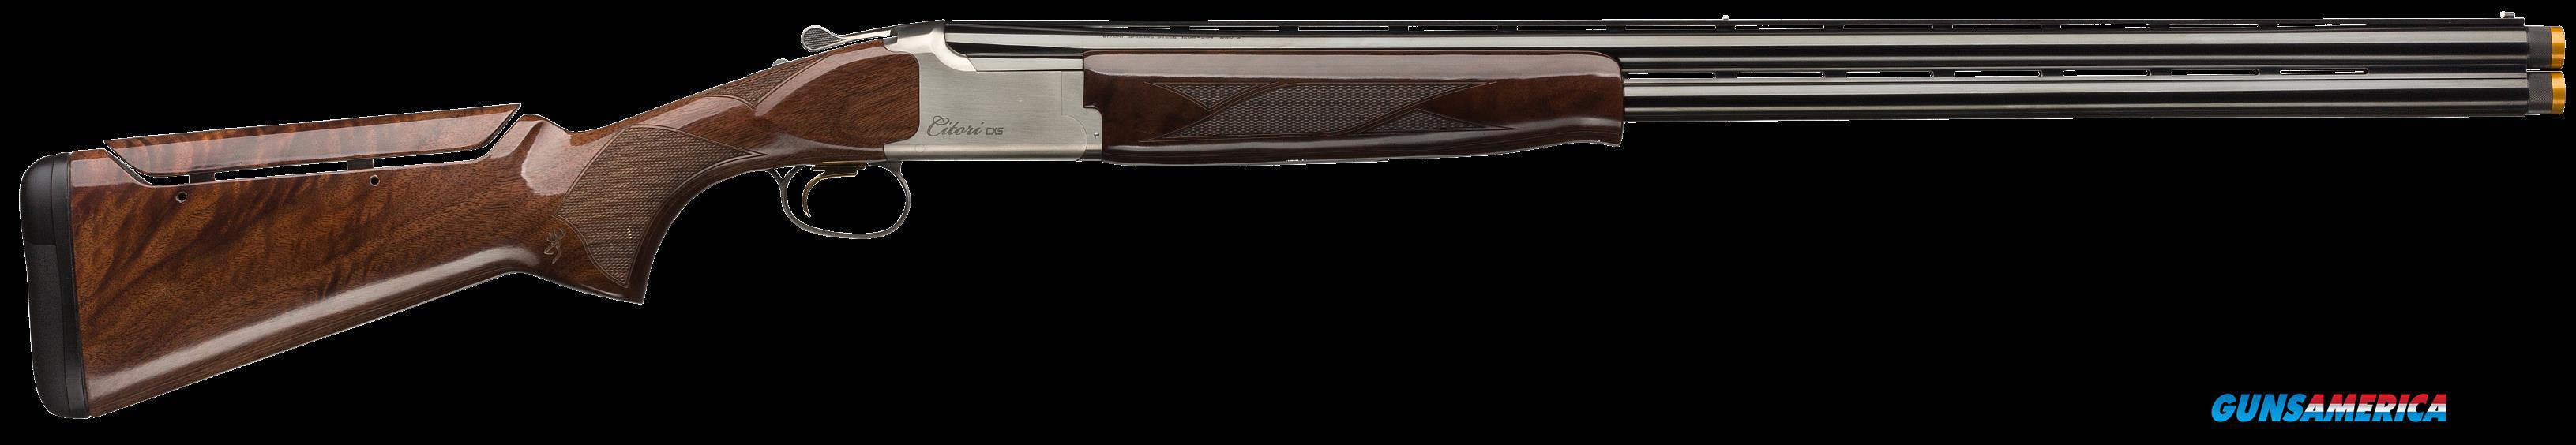 Browning Citori, Brn 018-149303  Cit Cxs Wht  12 30 Wal Ac  Guns > Pistols > 1911 Pistol Copies (non-Colt)